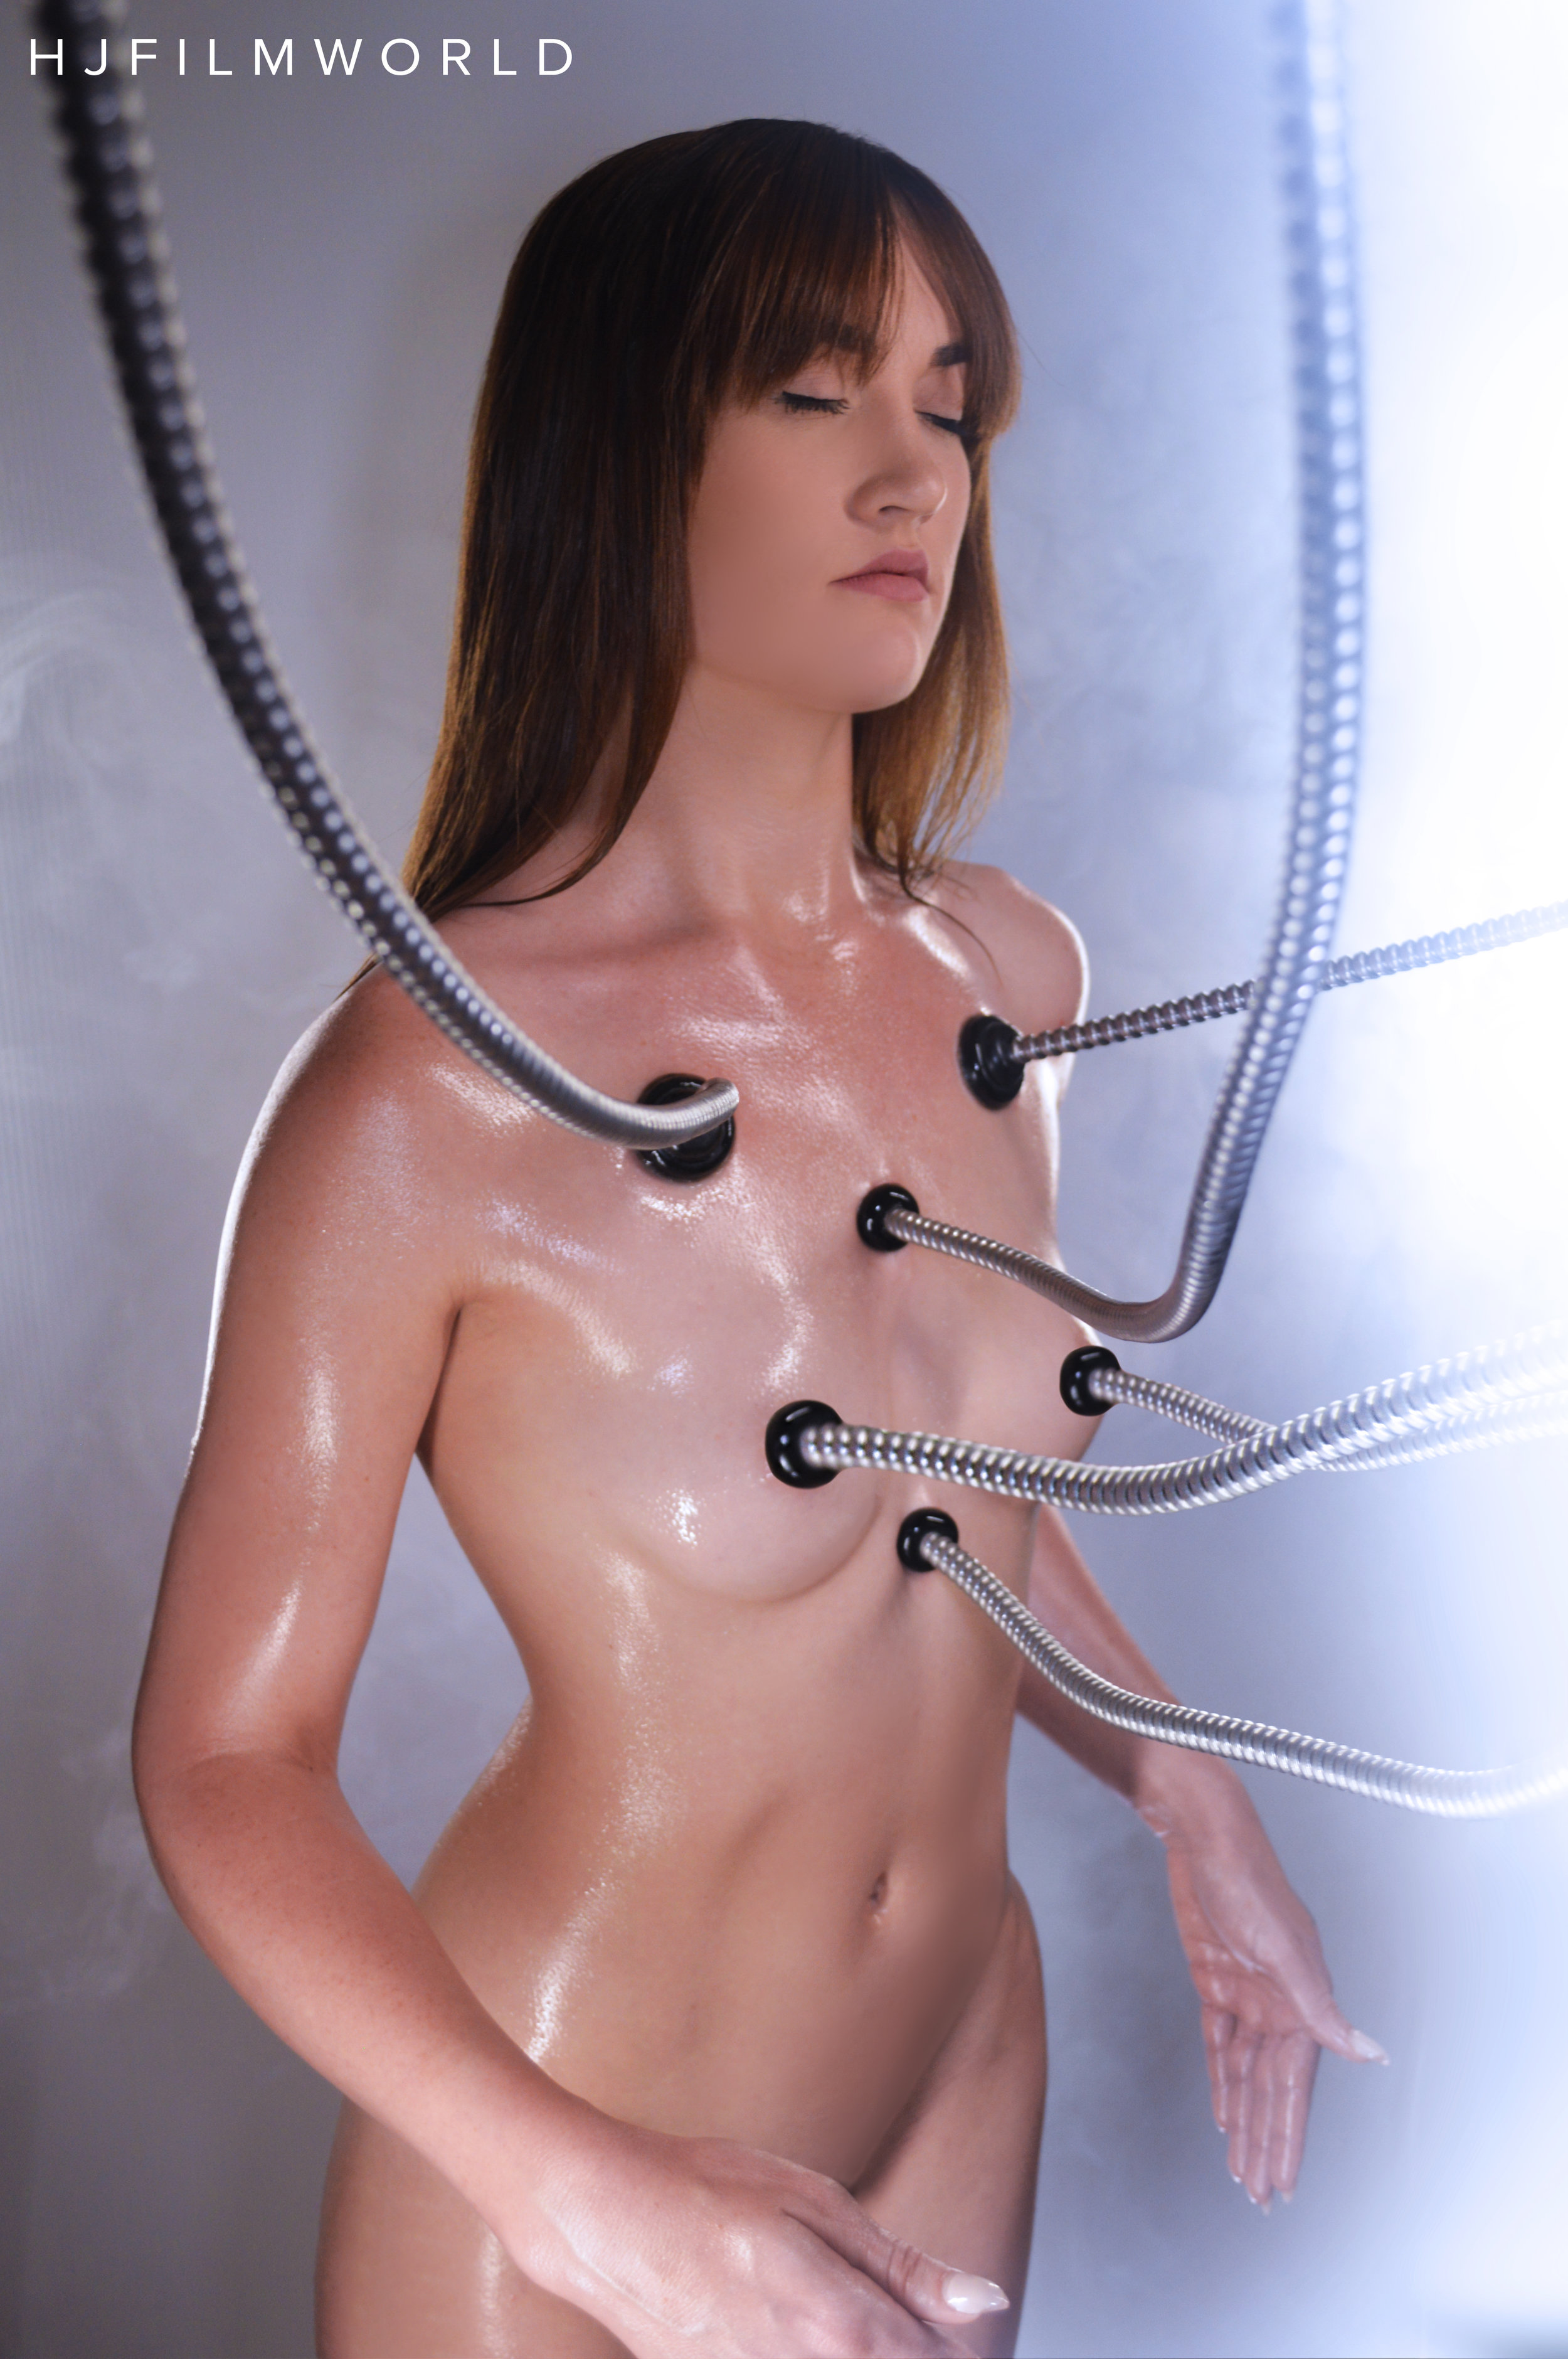 Model: Kat Monroe